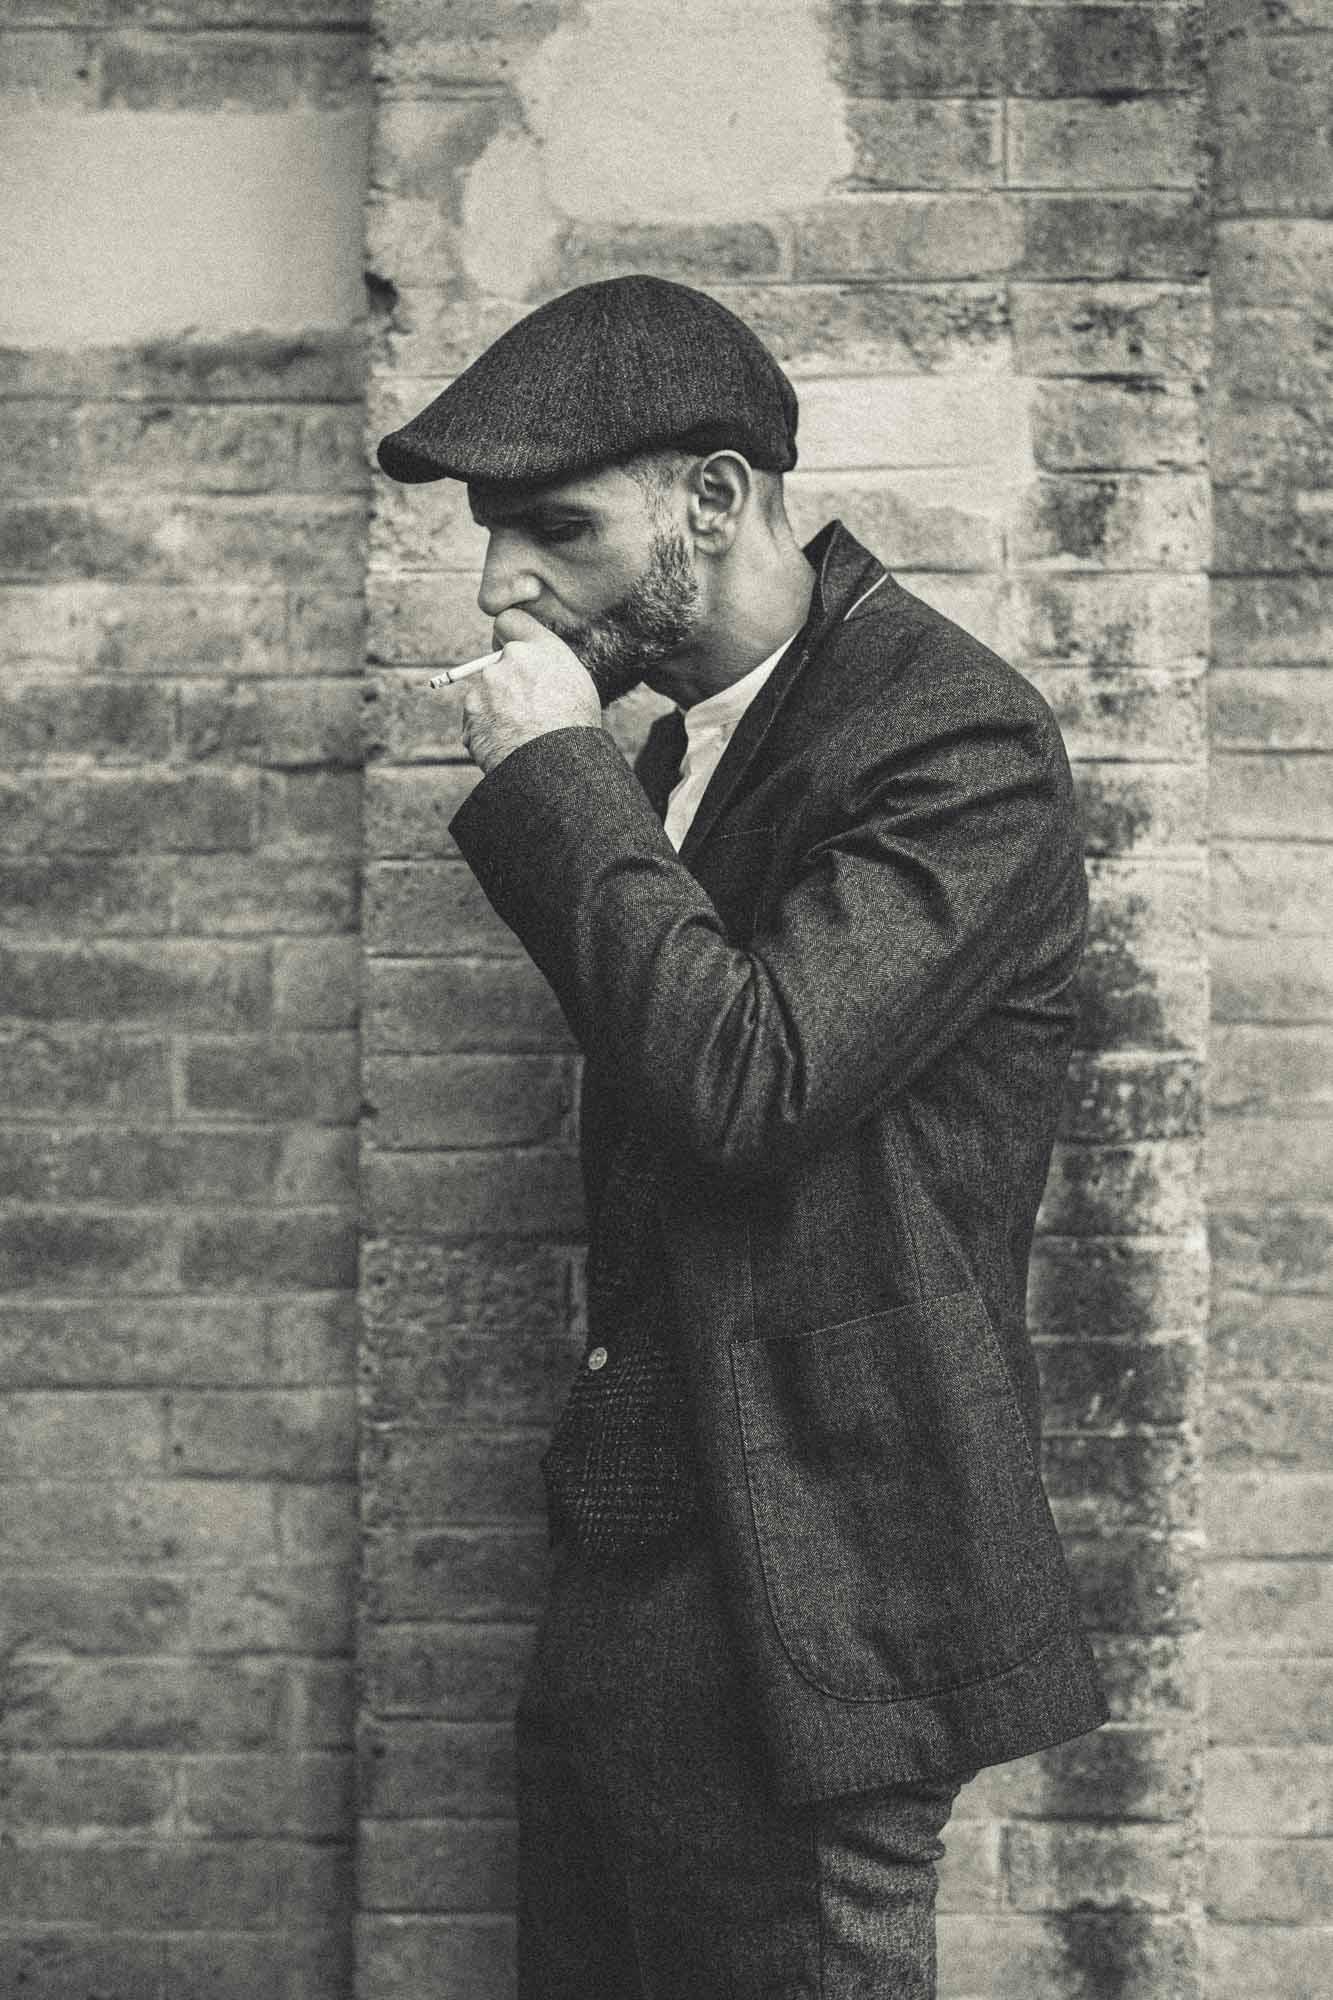 Peaky Blinder raucht